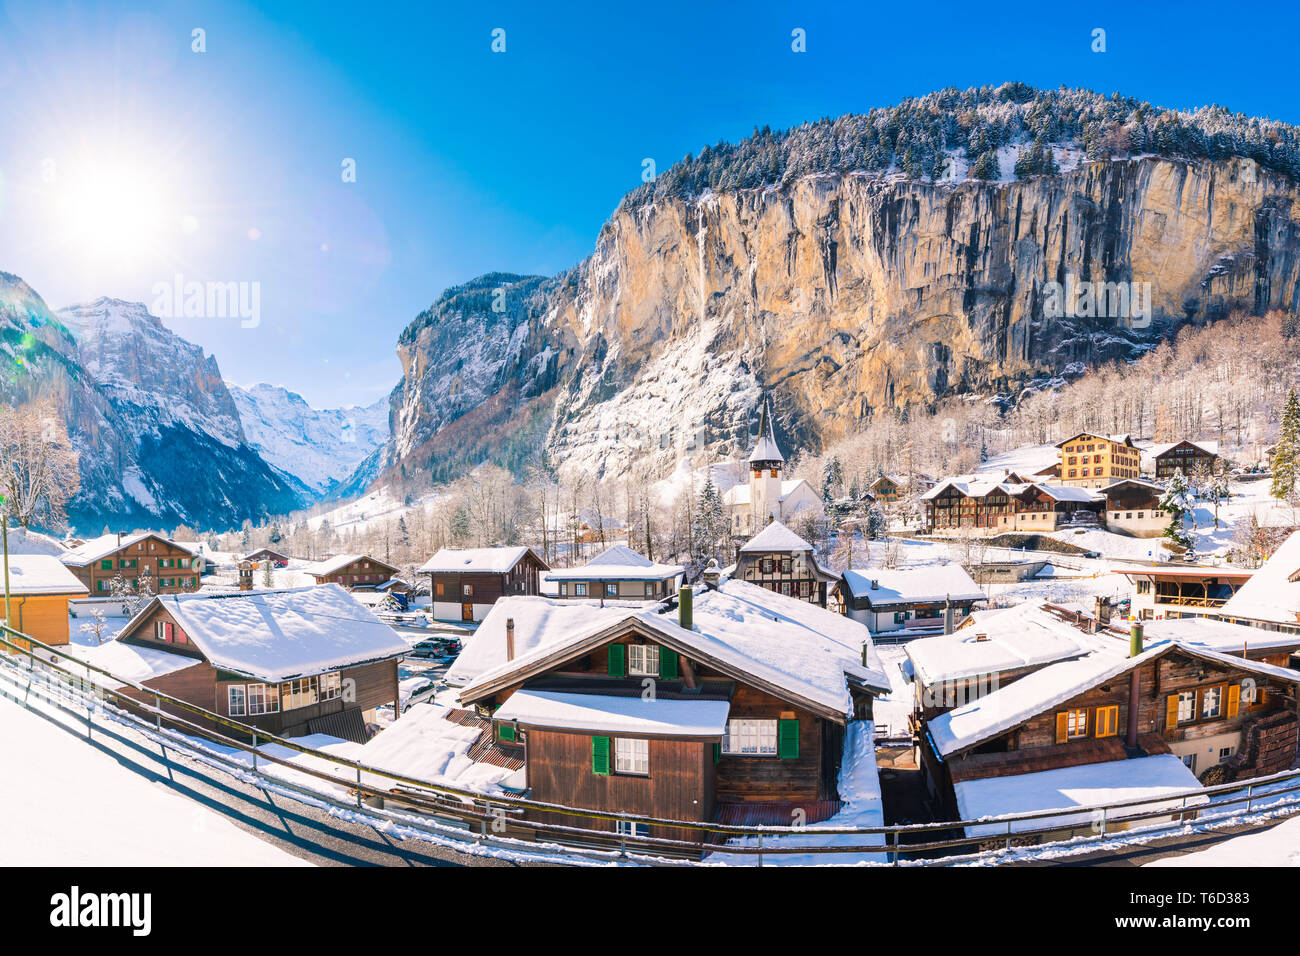 Lauterbrunnen, Berner Oberland, canton of Bern, Switzerland - Stock Image